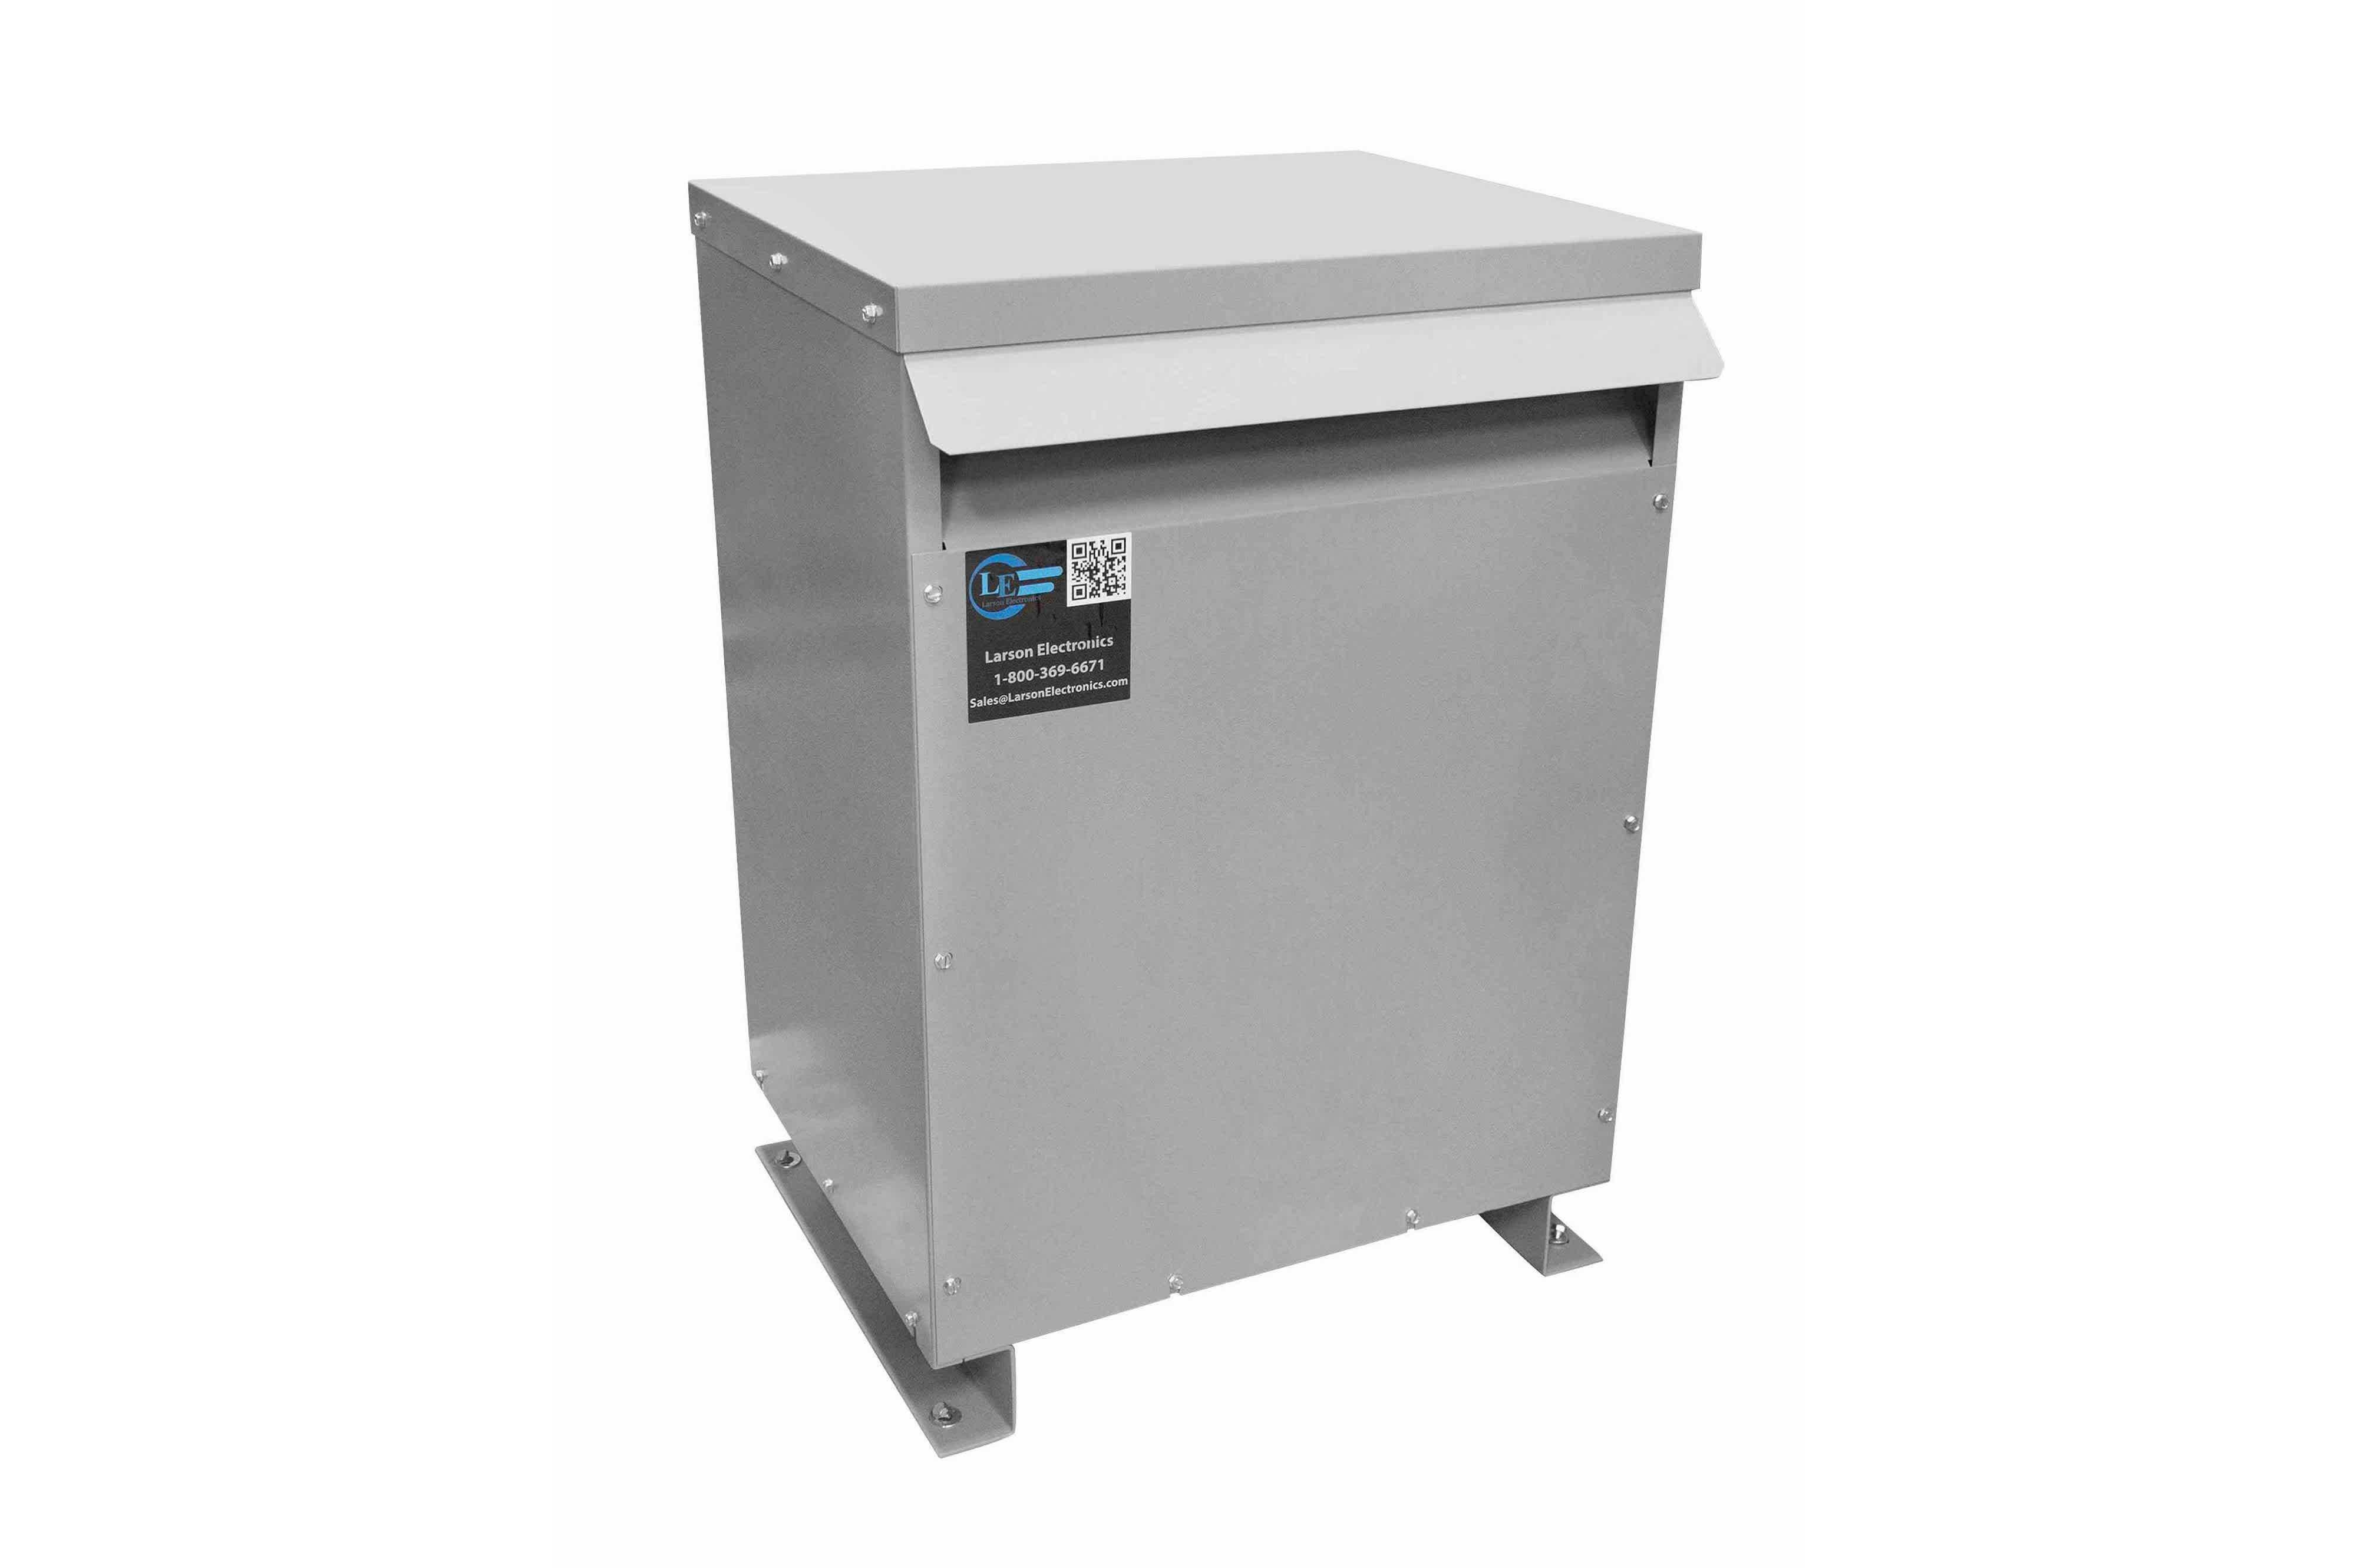 22.5 kVA 3PH Isolation Transformer, 460V Wye Primary, 400Y/231 Wye-N Secondary, N3R, Ventilated, 60 Hz